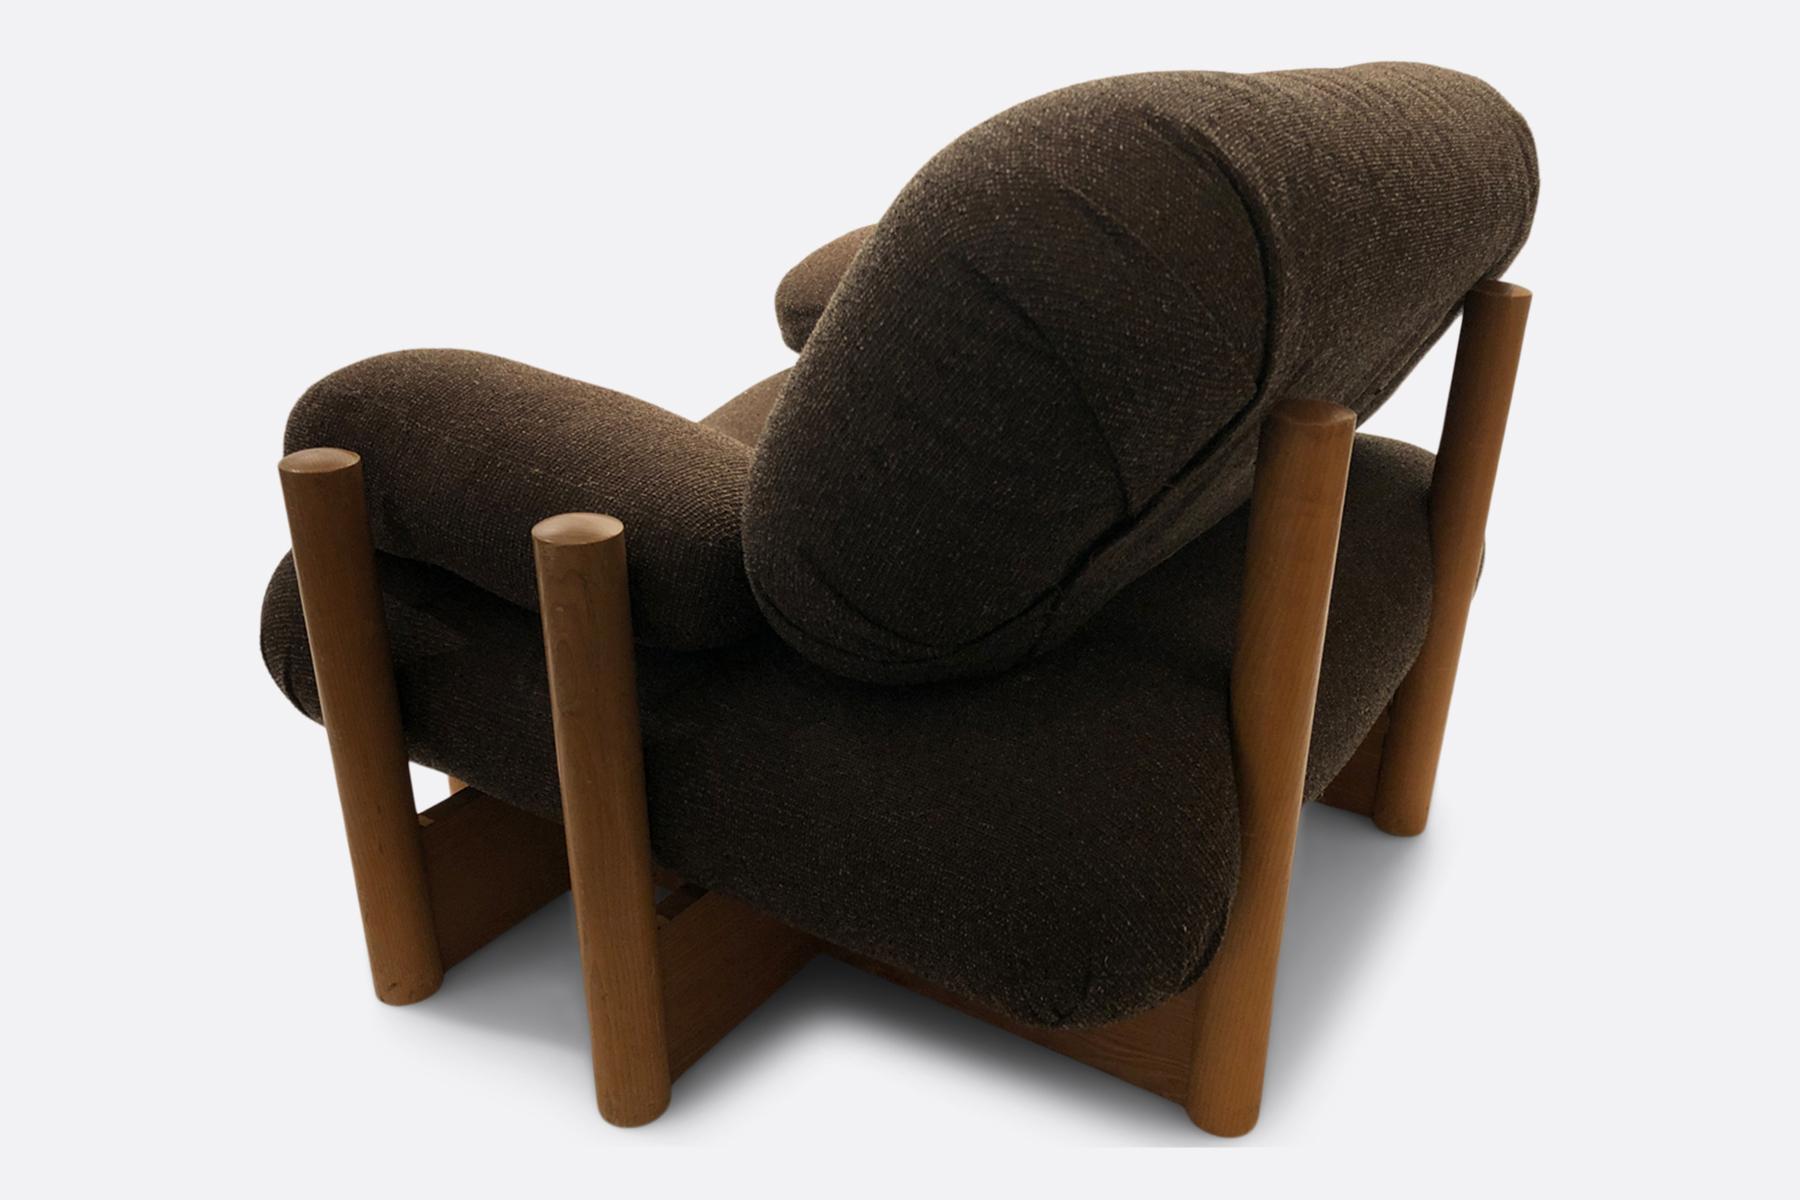 Case study chair